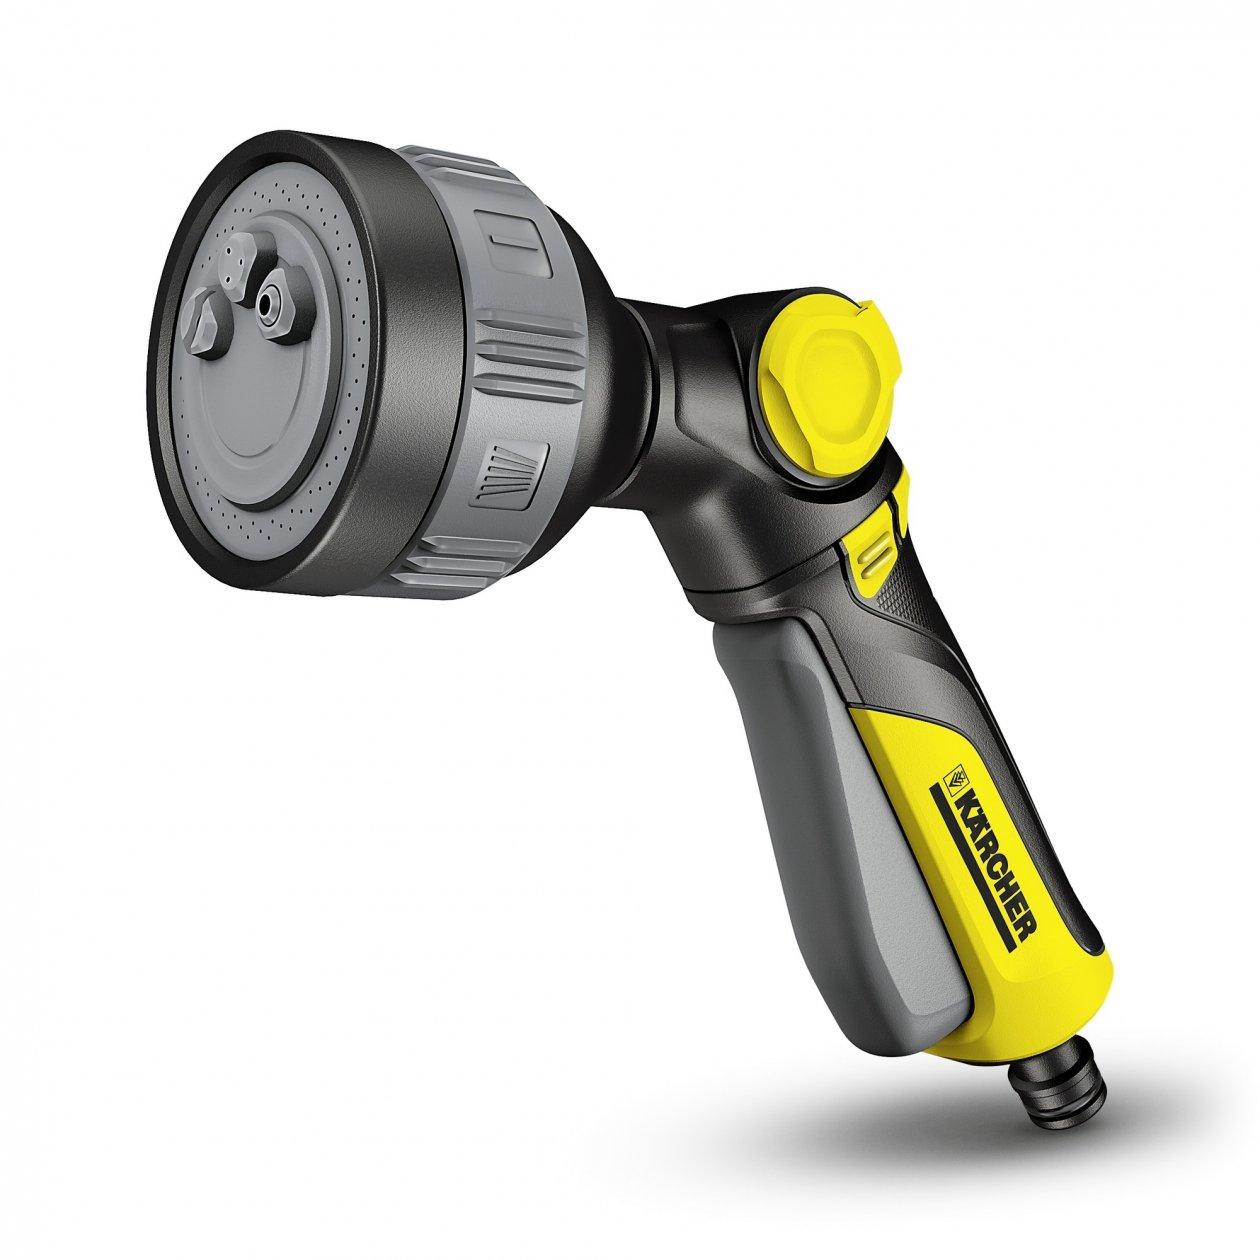 Karcher 2.645-269.0 19.2 x 7.0 x 16.2 cm Multi-Functional Spray Gun Plus - Yellow/Black/Grey